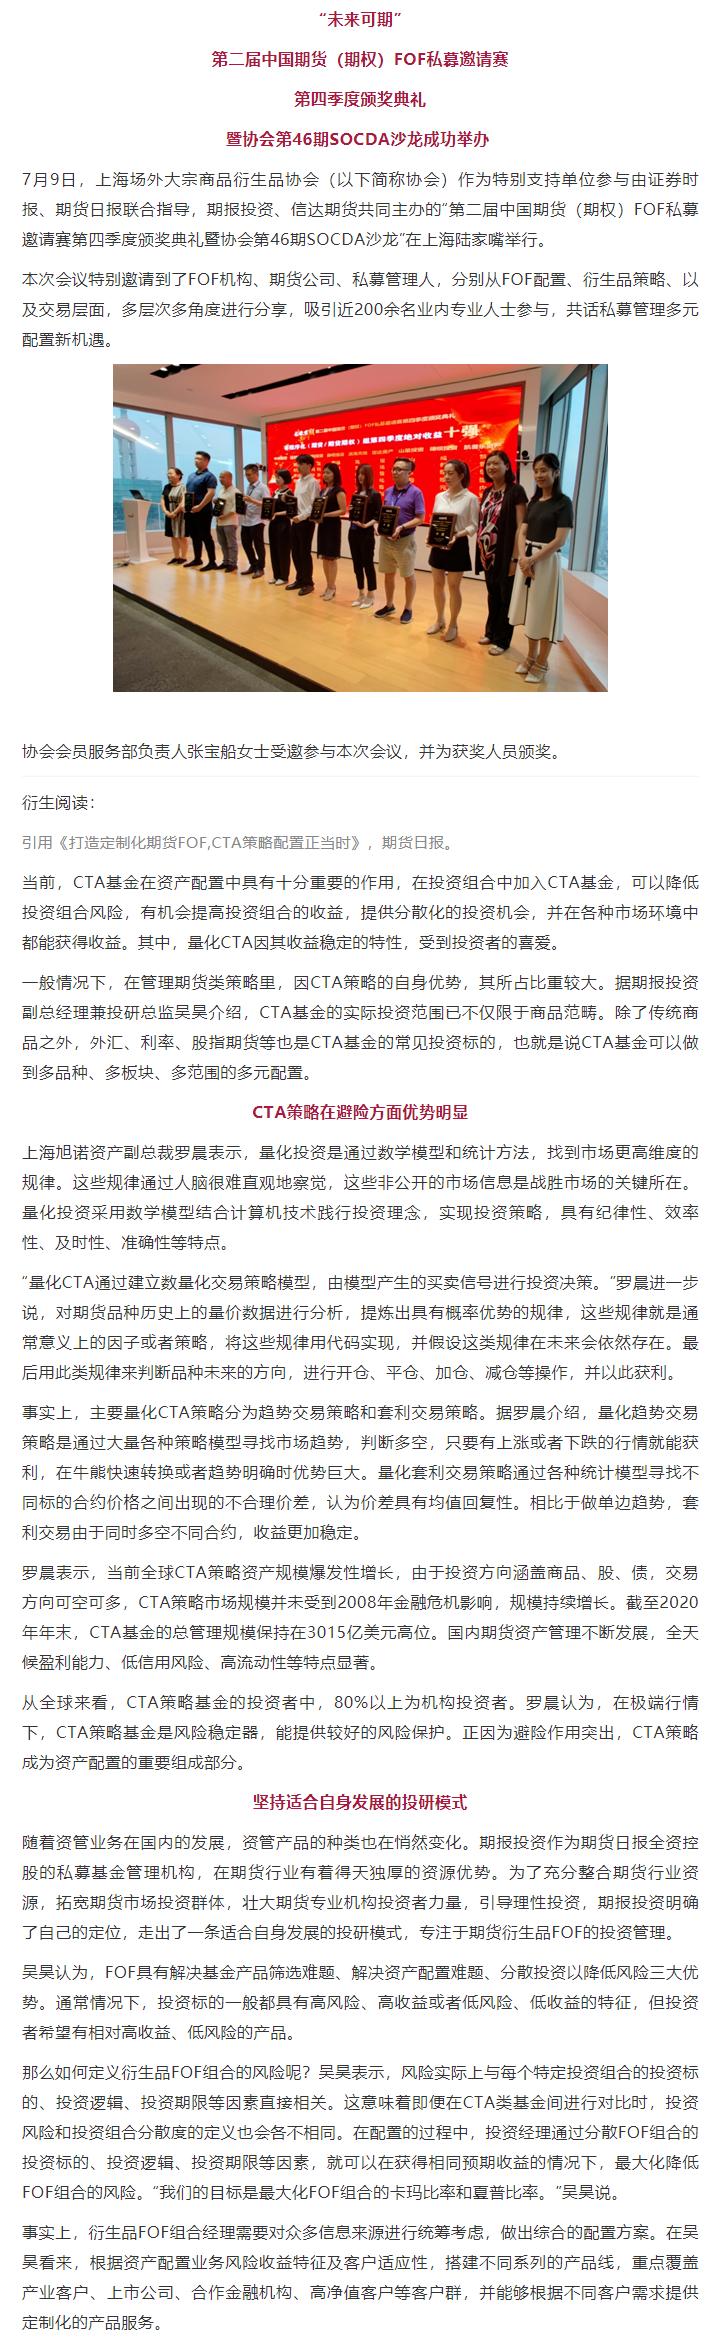 FireShot Capture 215 - 第二届中国期货(期权)FOF私募邀请赛暨协会第46期SOCDA沙龙成功举办 - mp.weixin.qq.com.png